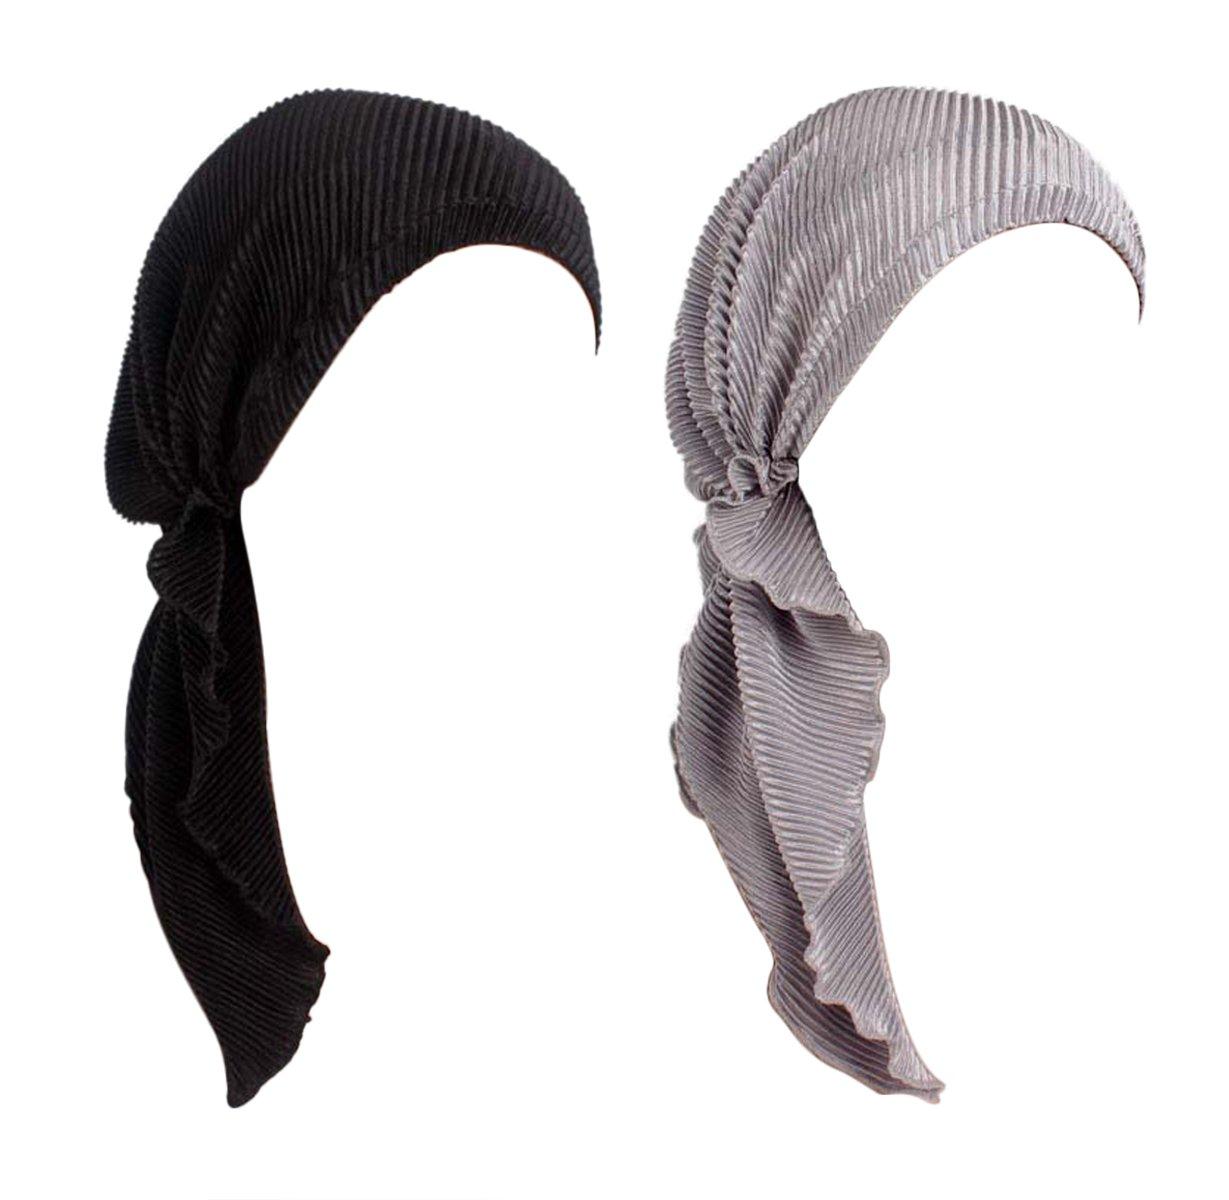 DancMolly Bandana Scarf Pre Tied Chemo Turban Elastic Beanies Hat Summer Headwear for Cancer (Ruffle-Black+Gray)